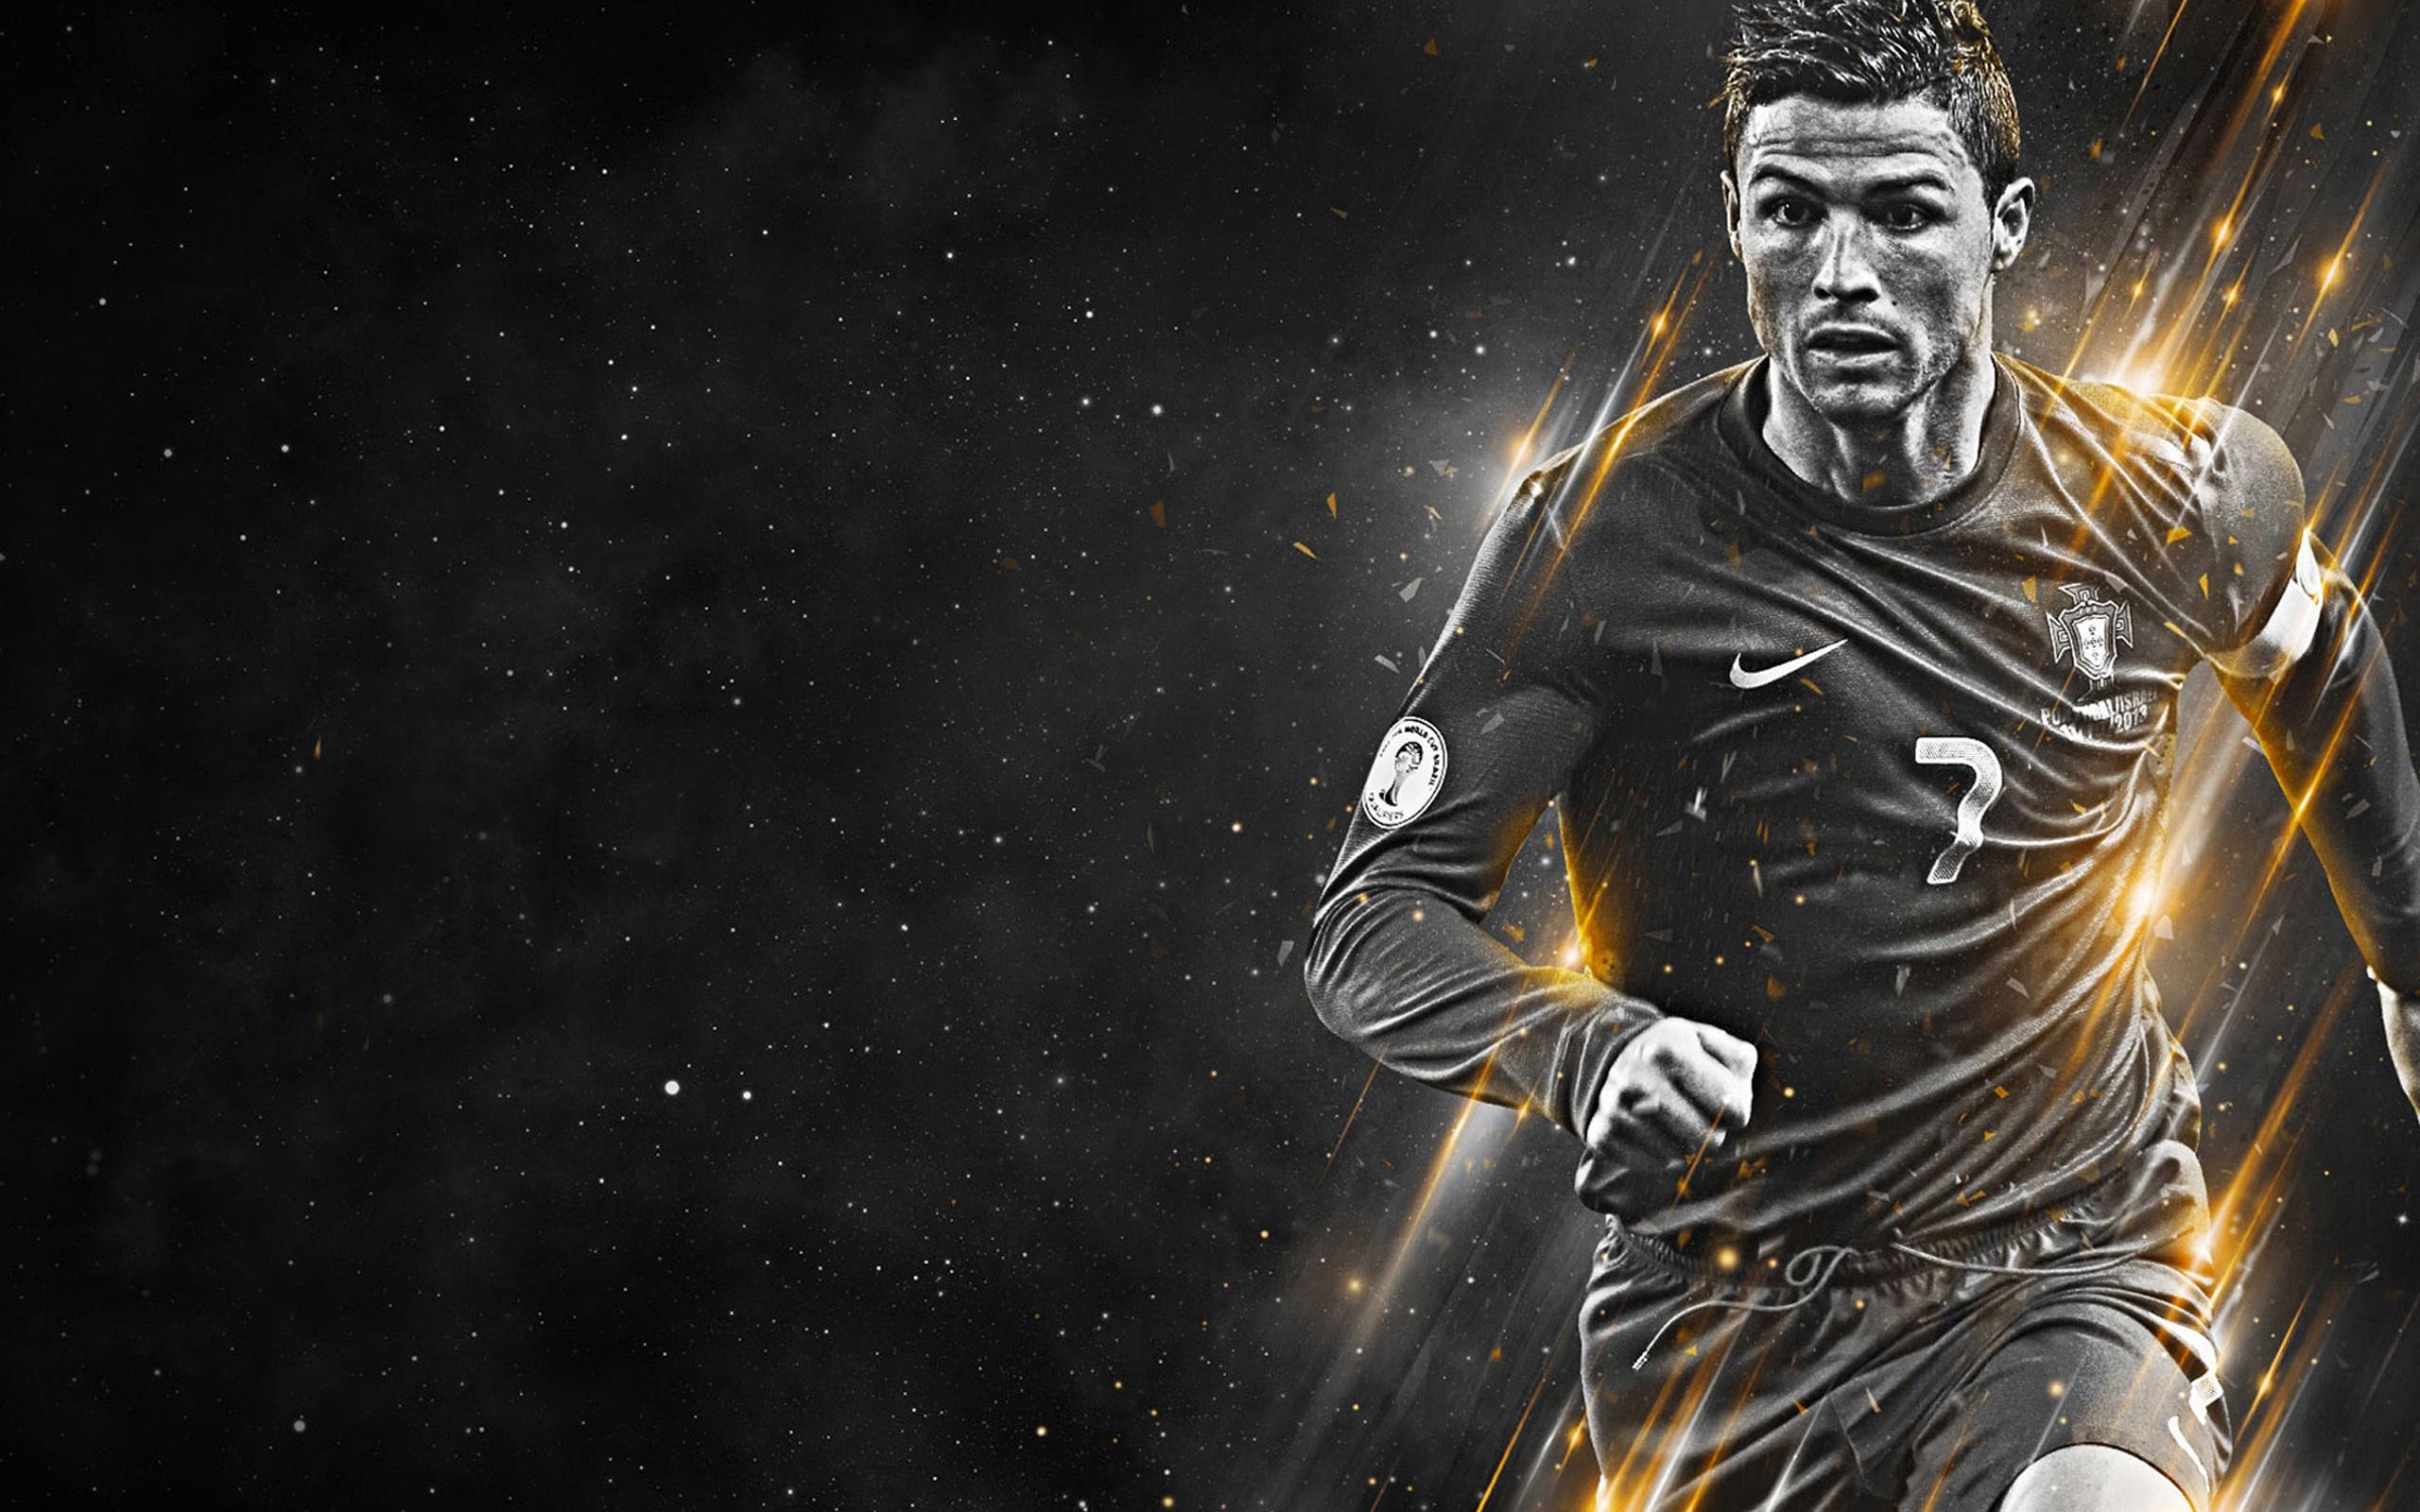 Cristiano Ronaldo Football Player Wallpapers